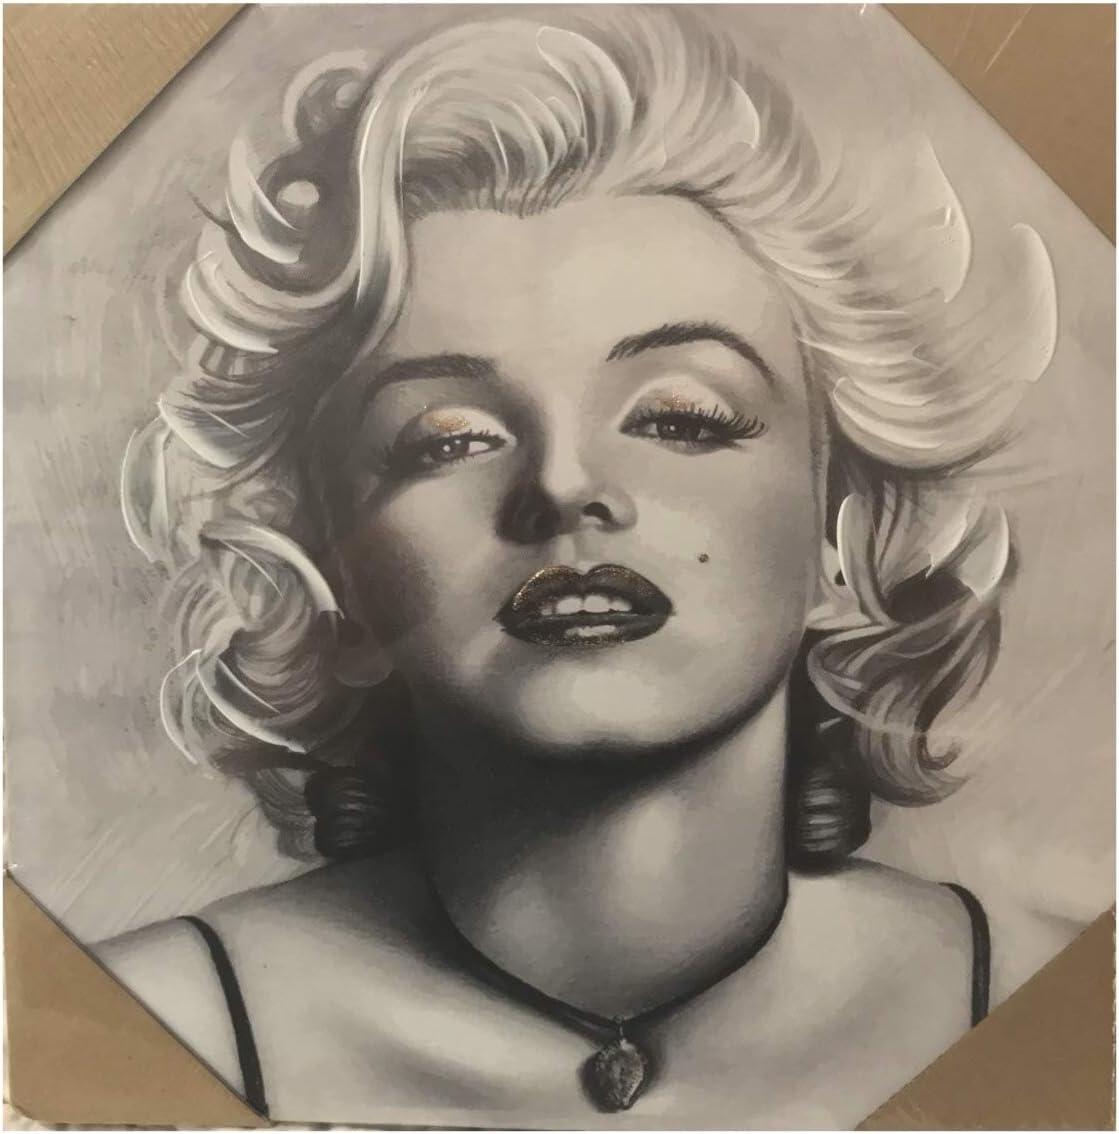 MARILYN MONROE CANVAS WALL ART BLACK/&WHITE